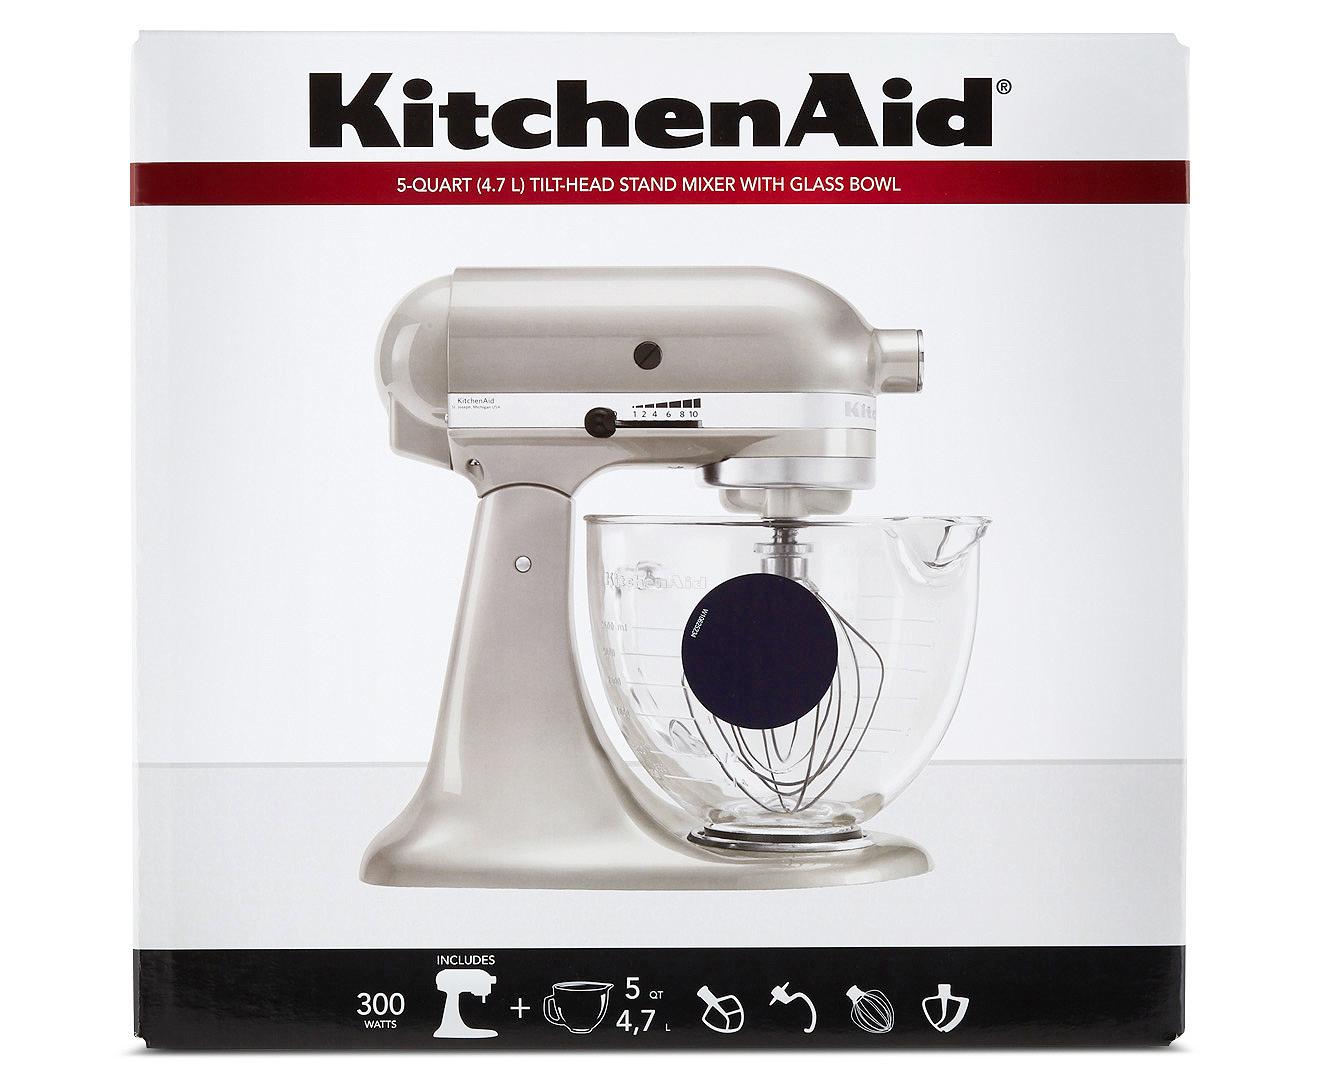 Kitchenaid Ksm156 Platinum Stand Mixer Blueberry